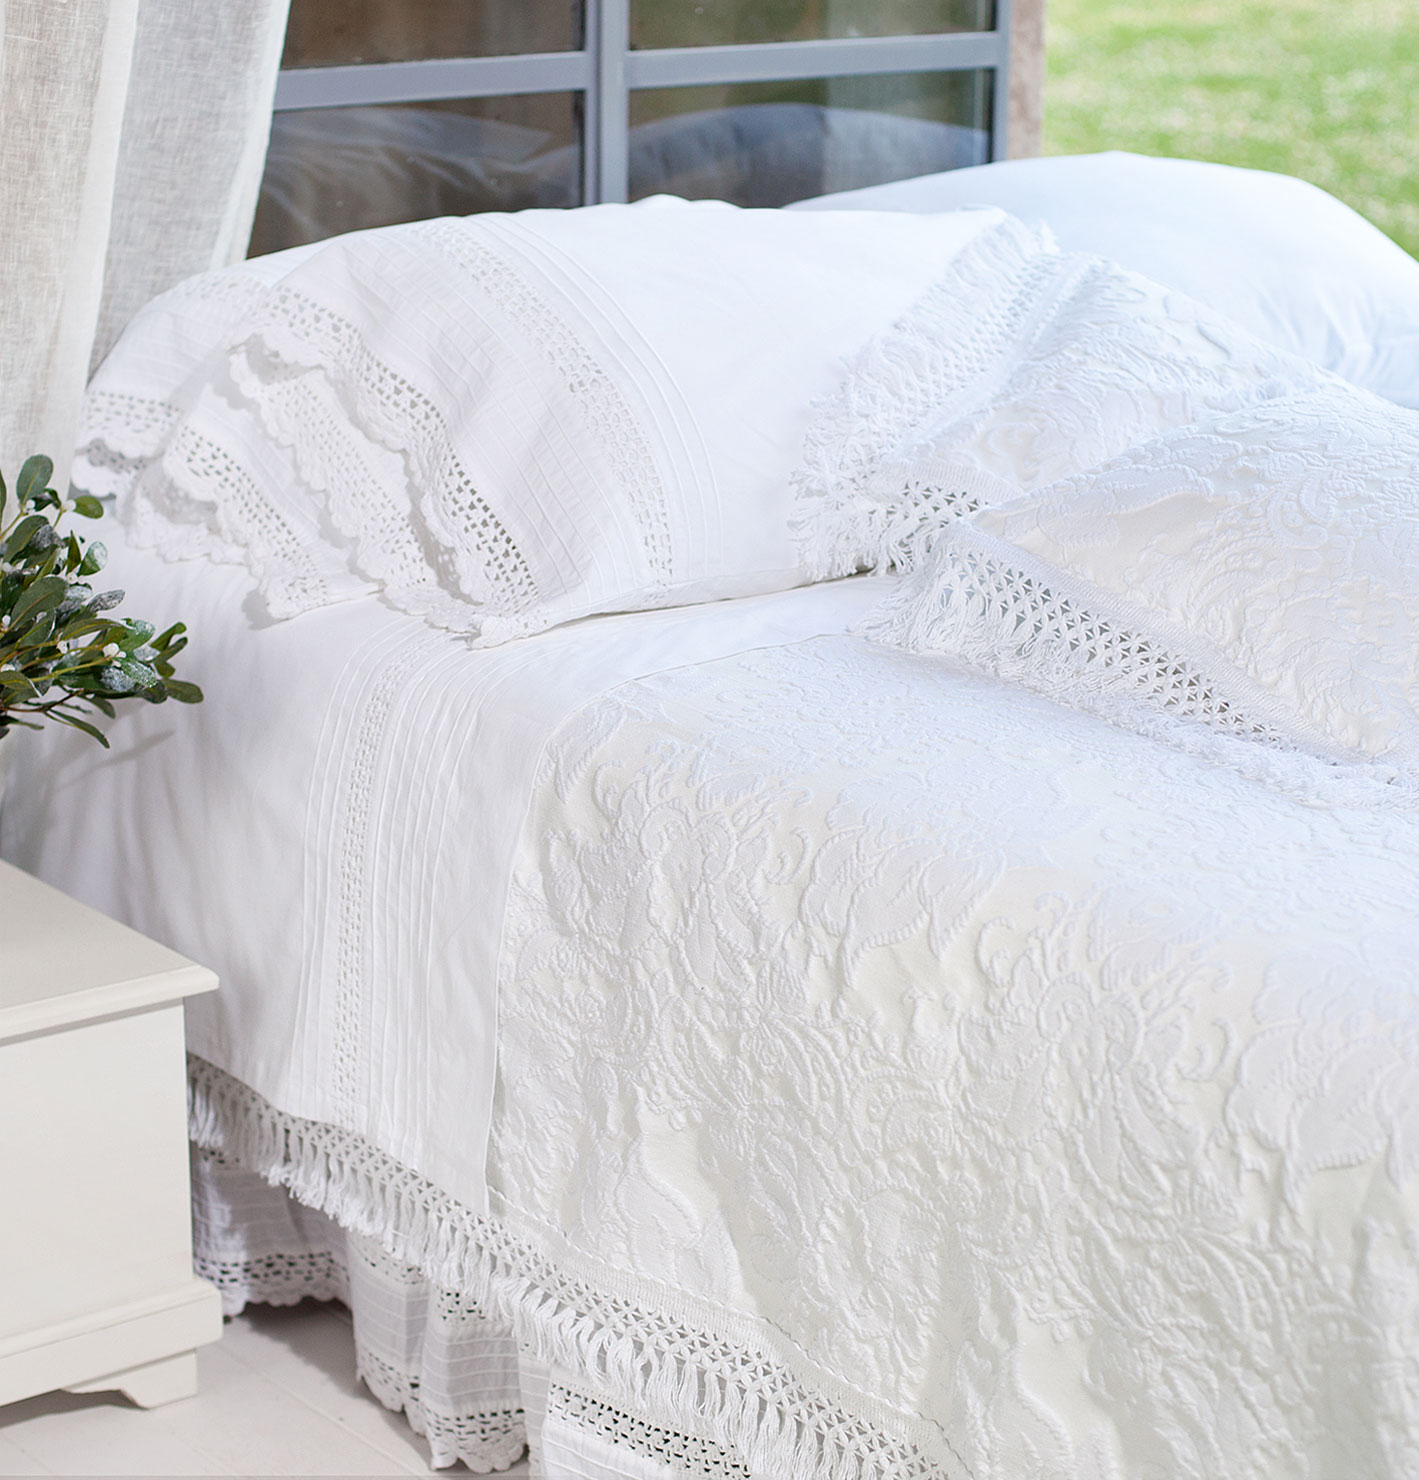 Copriletto Matrimoniale Ana Collection Blanc Maricl